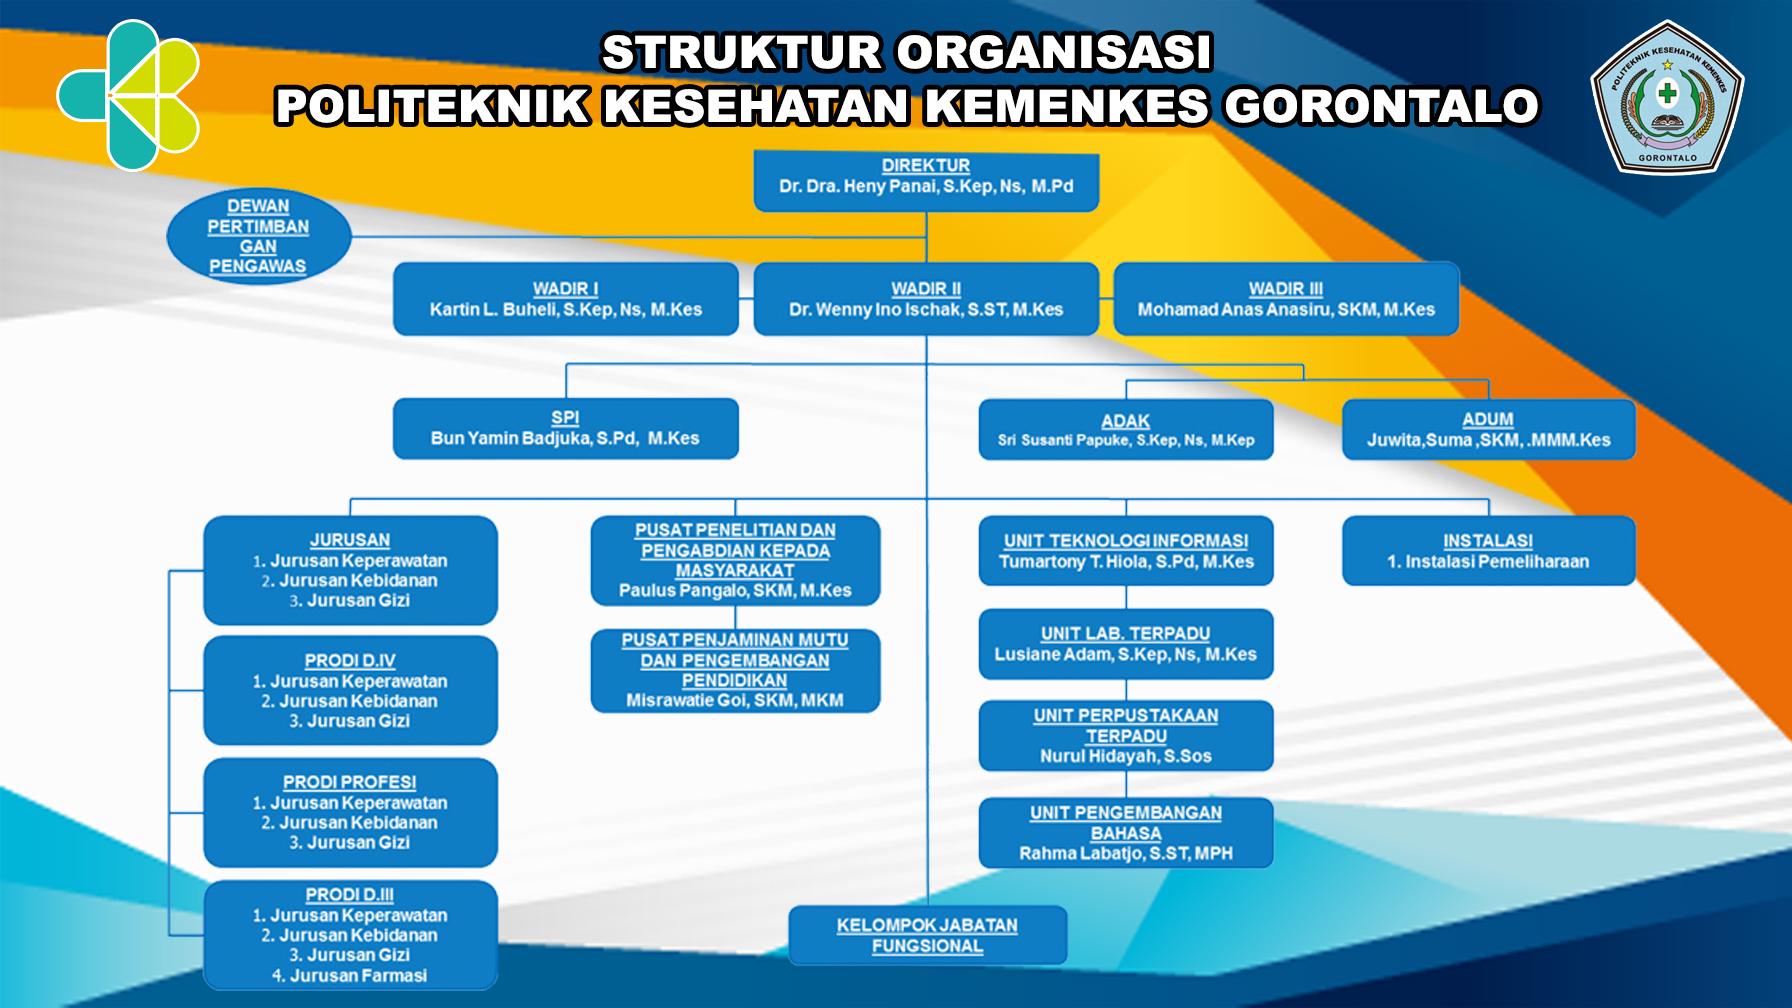 Struktur Organisassi Poltekkes Kemenkes Gorontalo